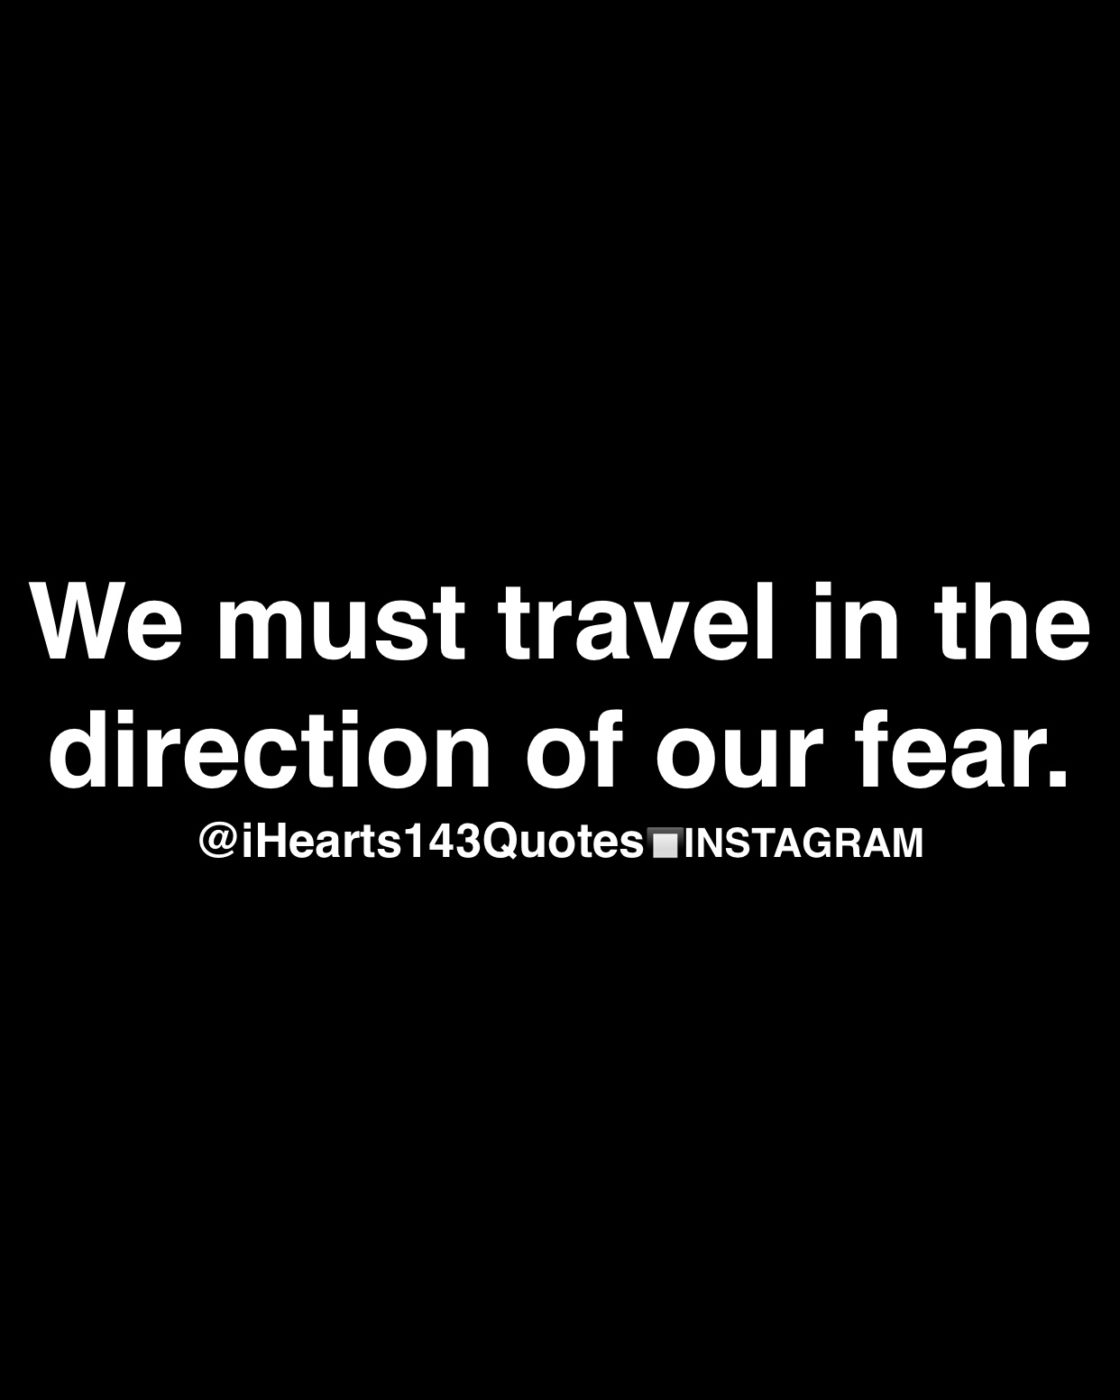 Wisdom Quotes Wisdom Quotes  Ihearts143Quotes